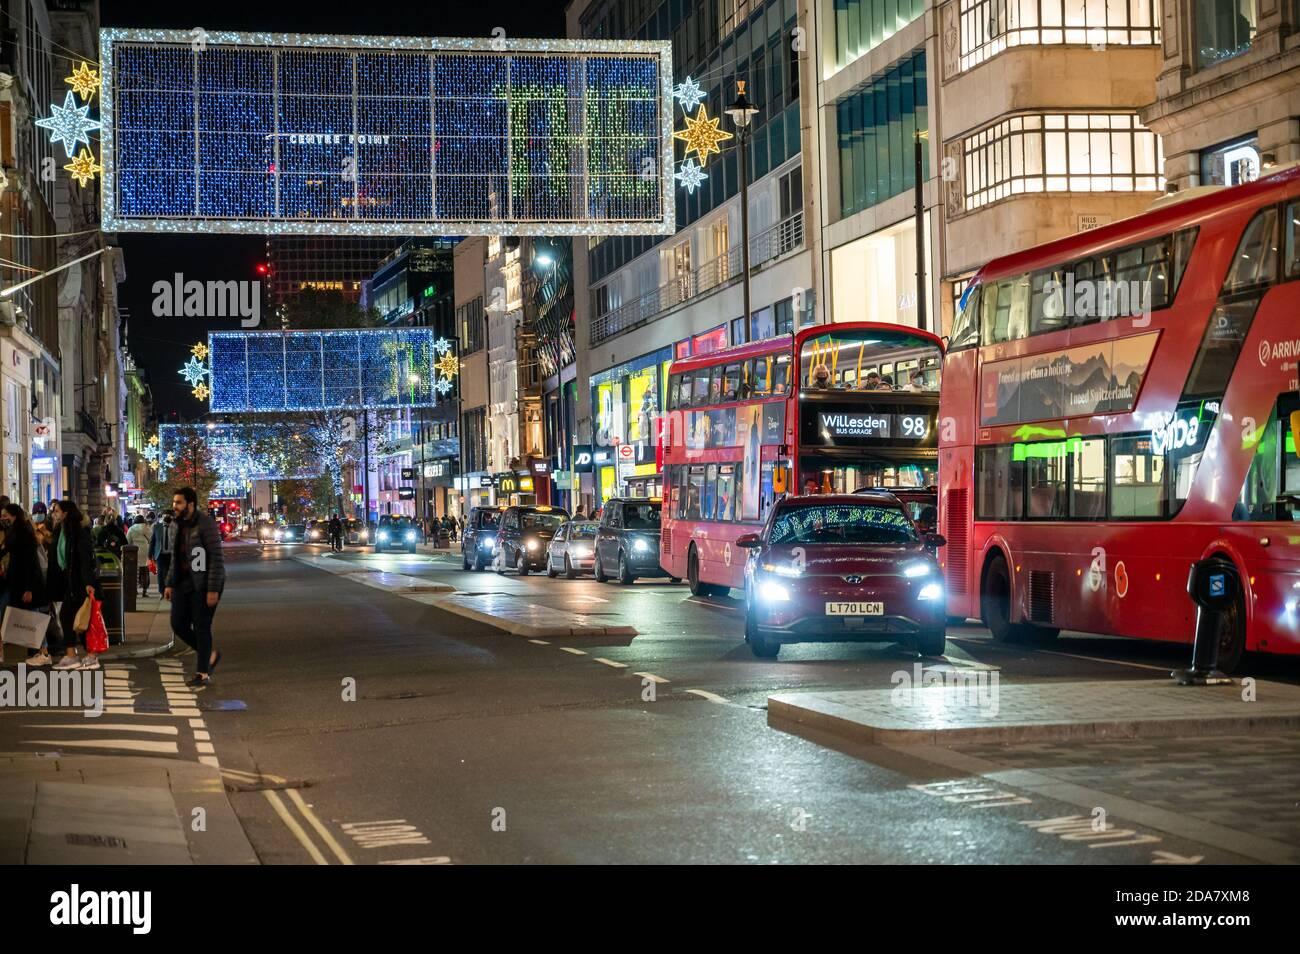 Christmas Traffic 2020 LONDON   NOVEMBER 3, 2020: Traffic beneath the Oxford Street